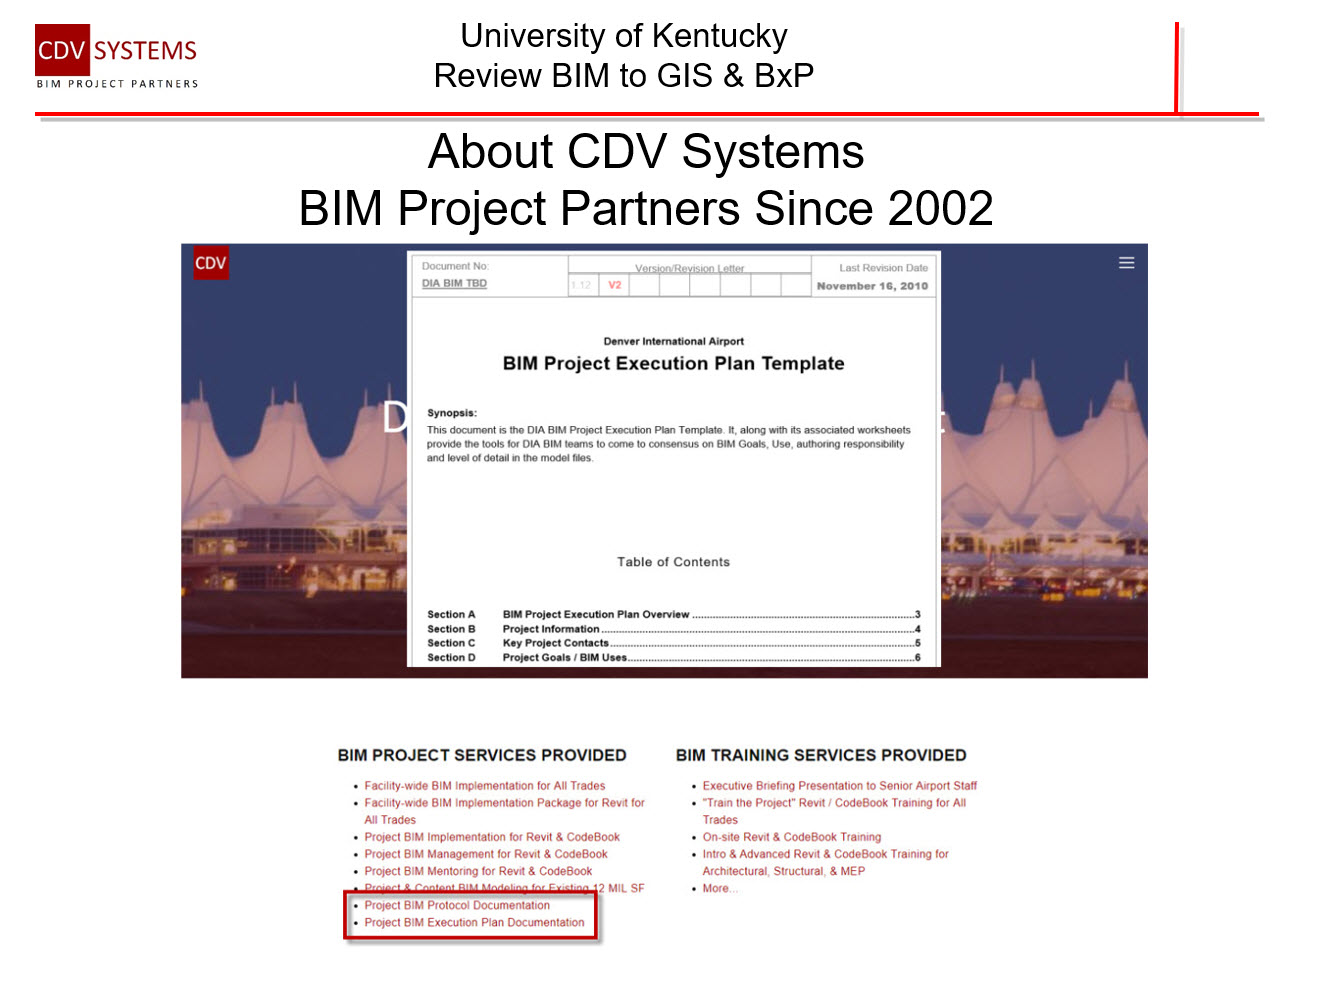 University of Kentucky_001j.jpg